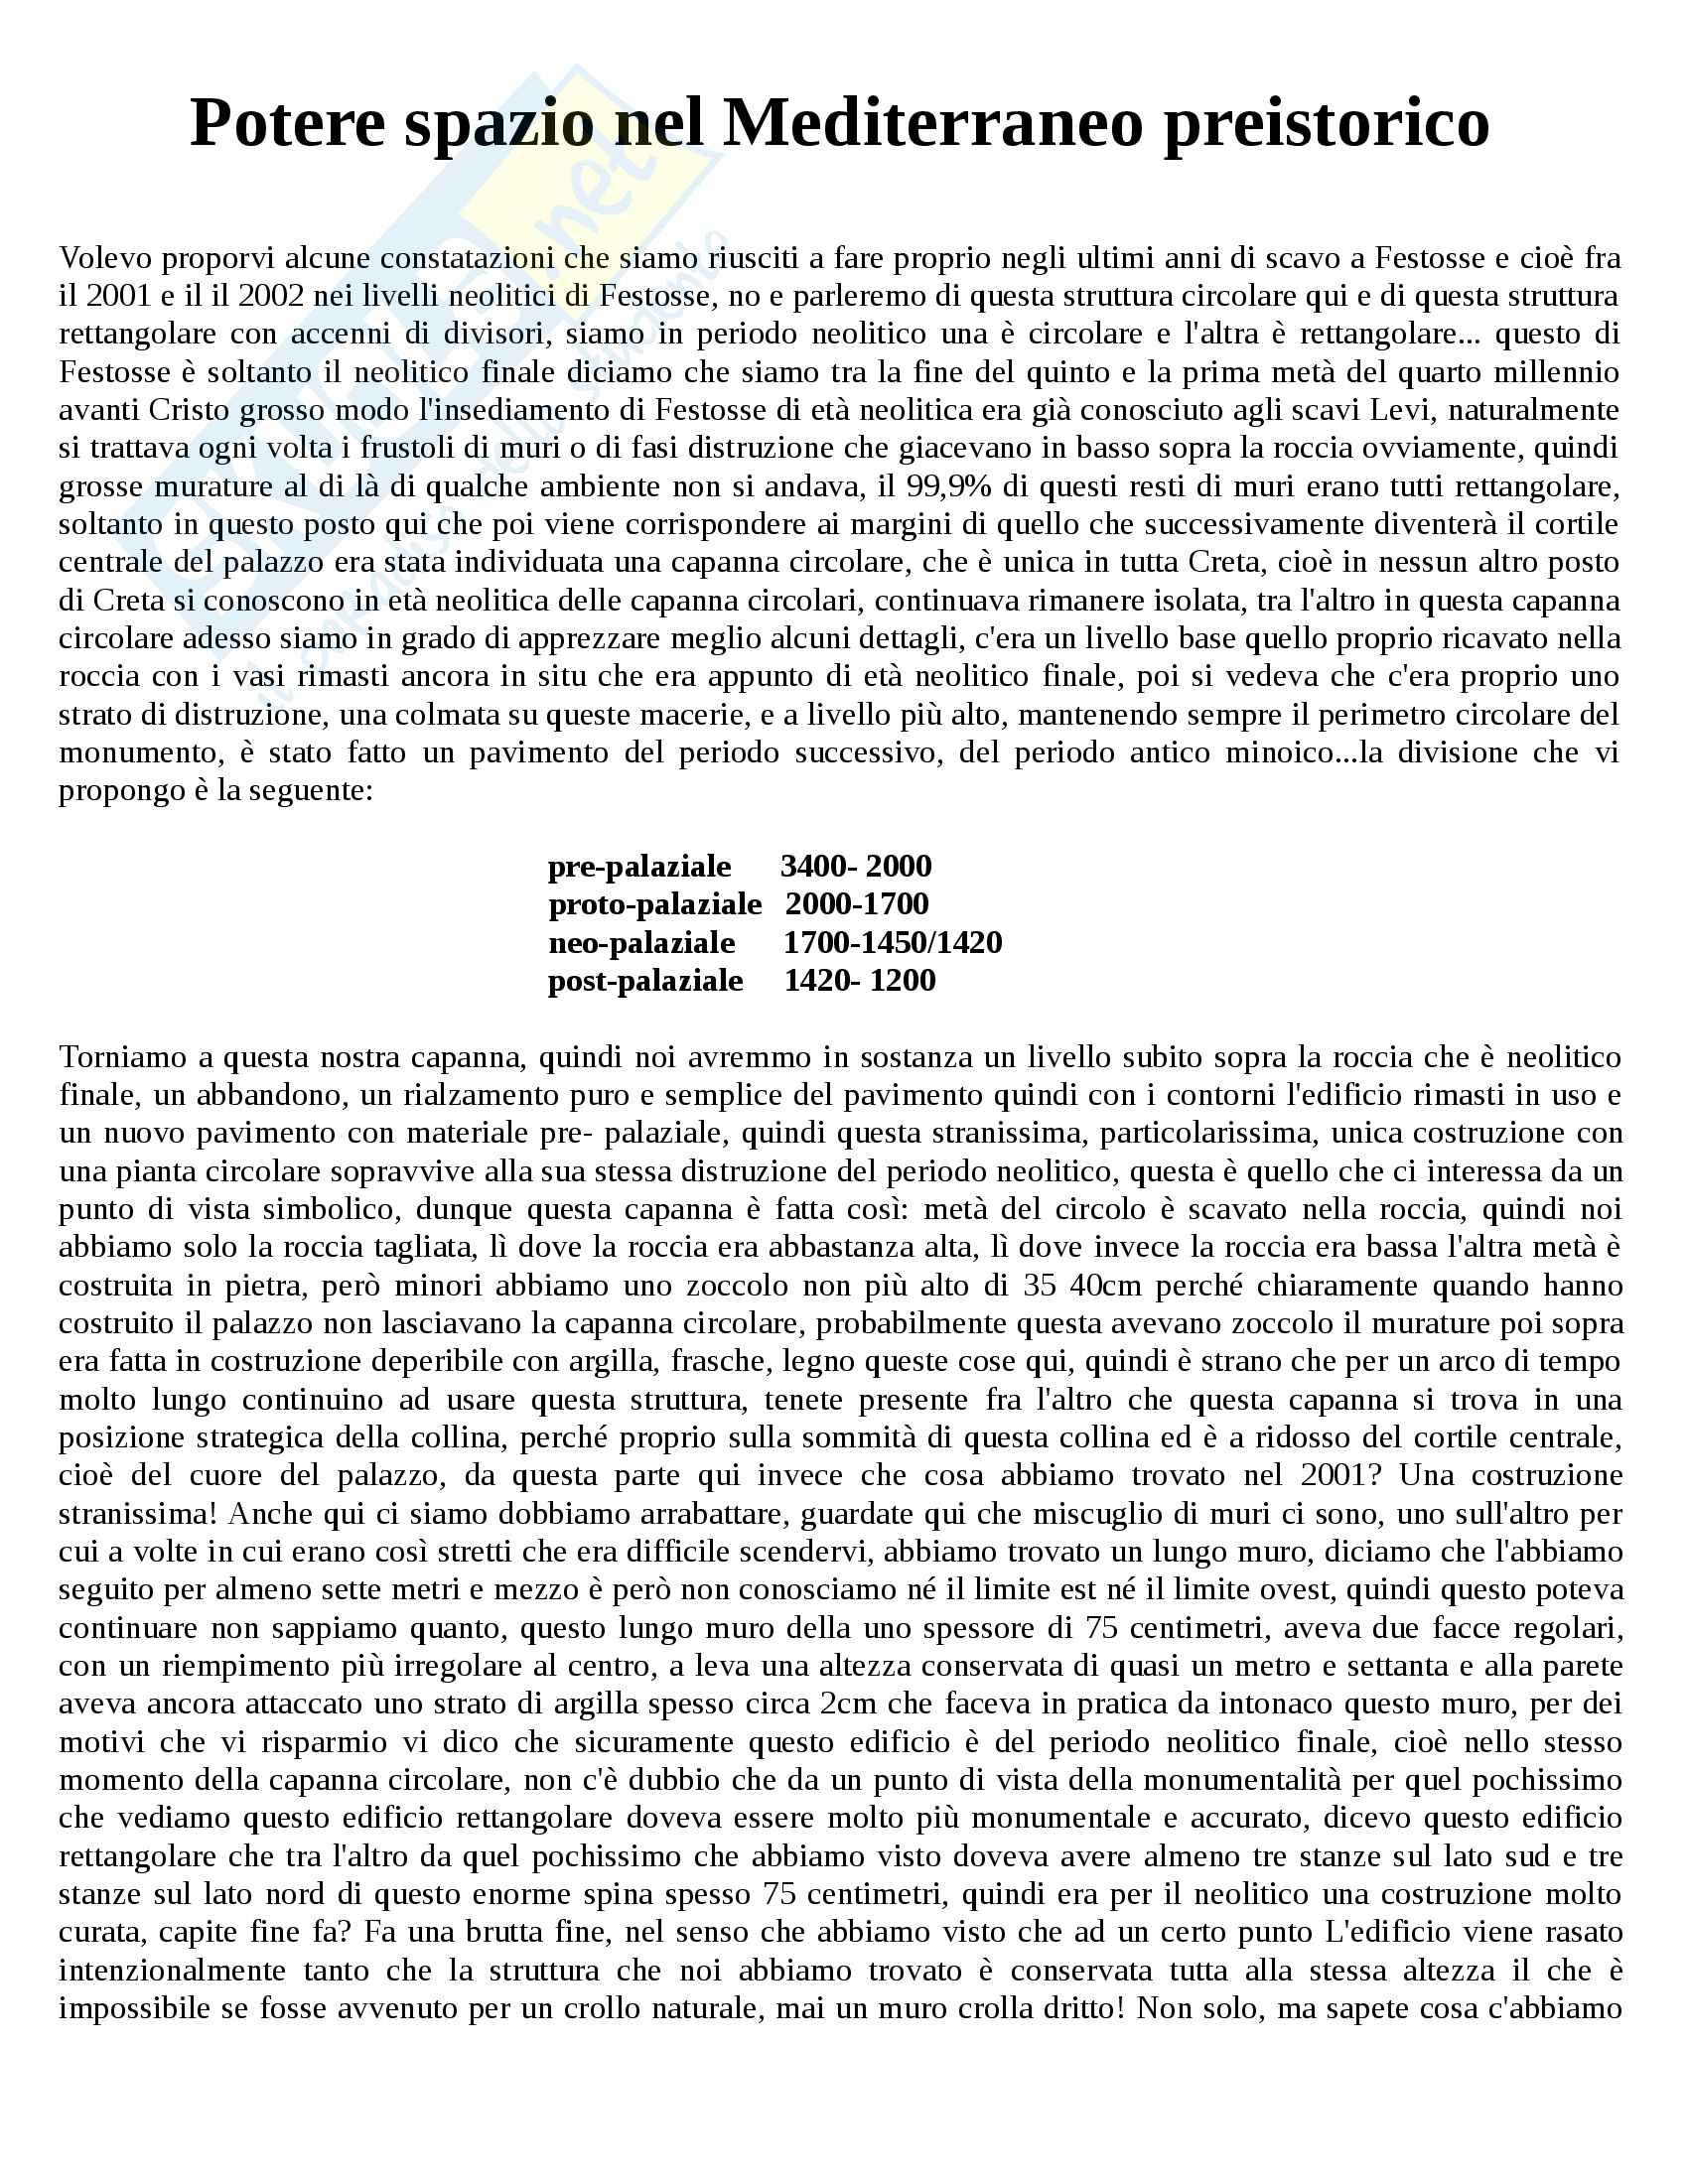 4 Lez Prof La Rosa La capanna circolare di Festosse Pag. 1